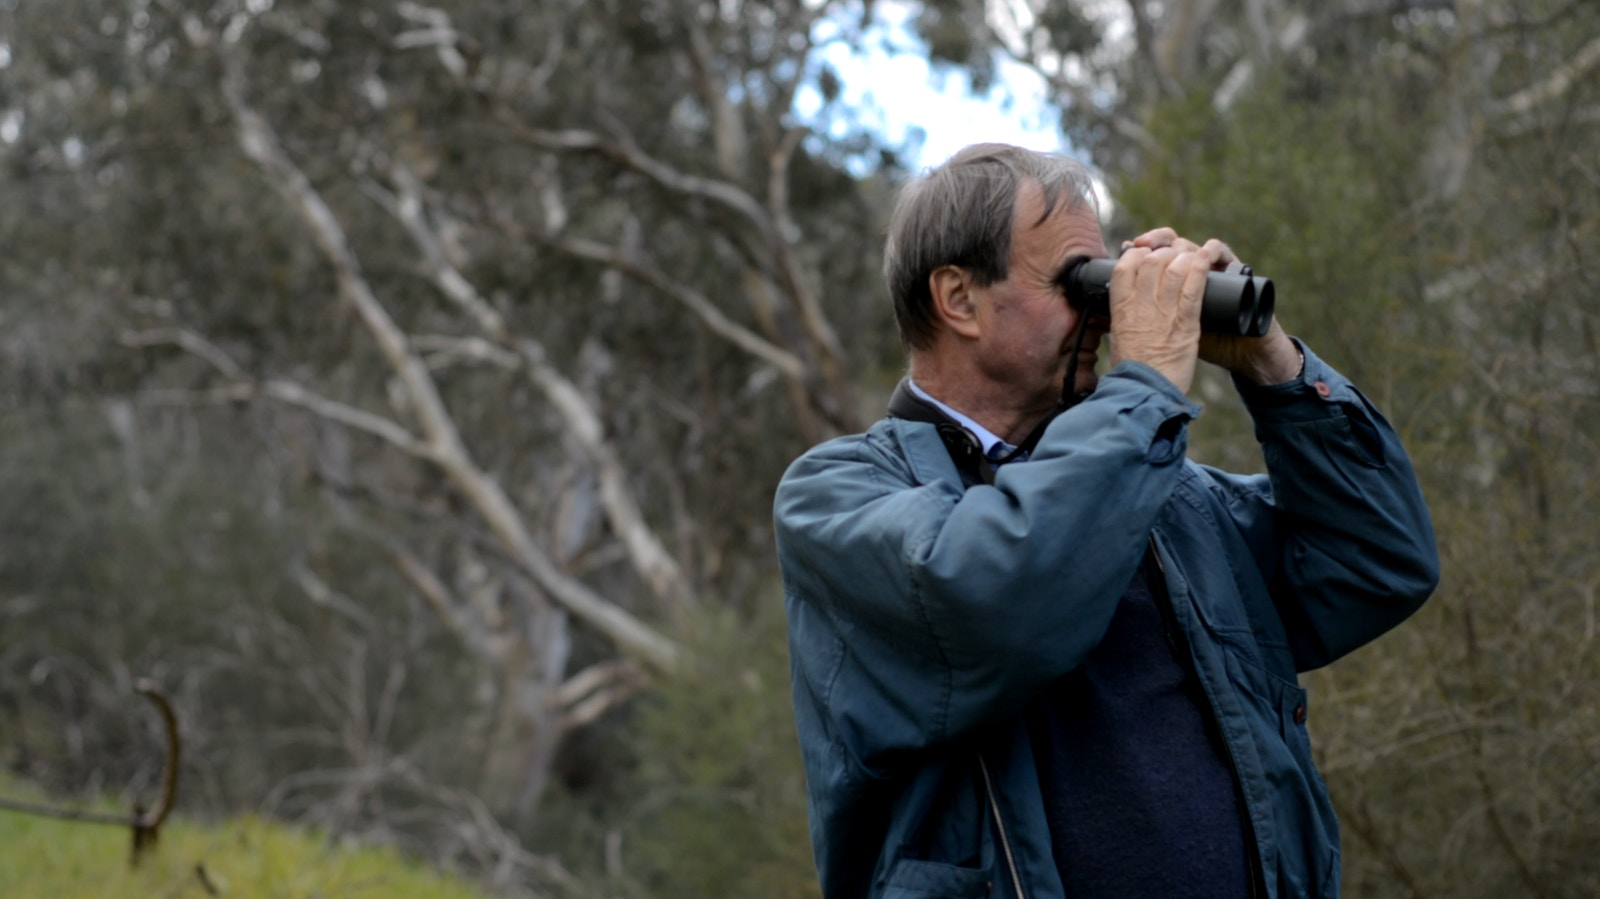 Bird watching in the Victorian Alps